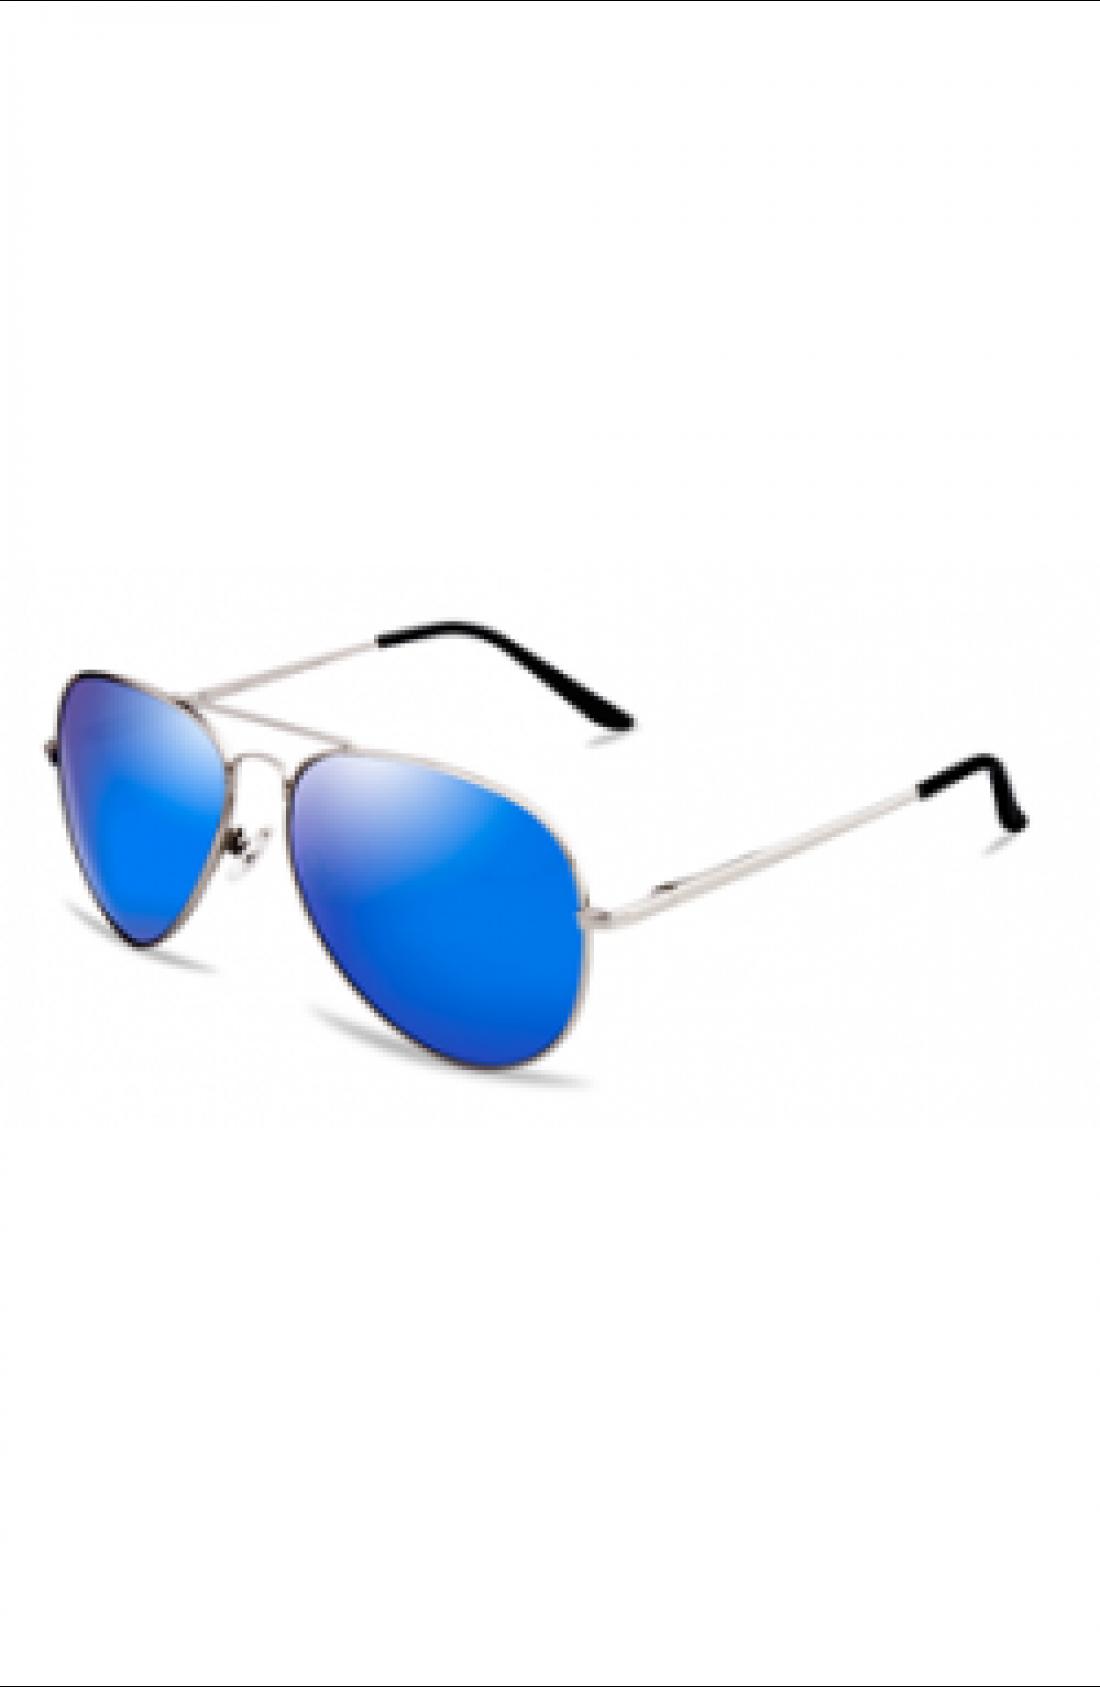 Sunglasses Style 996589